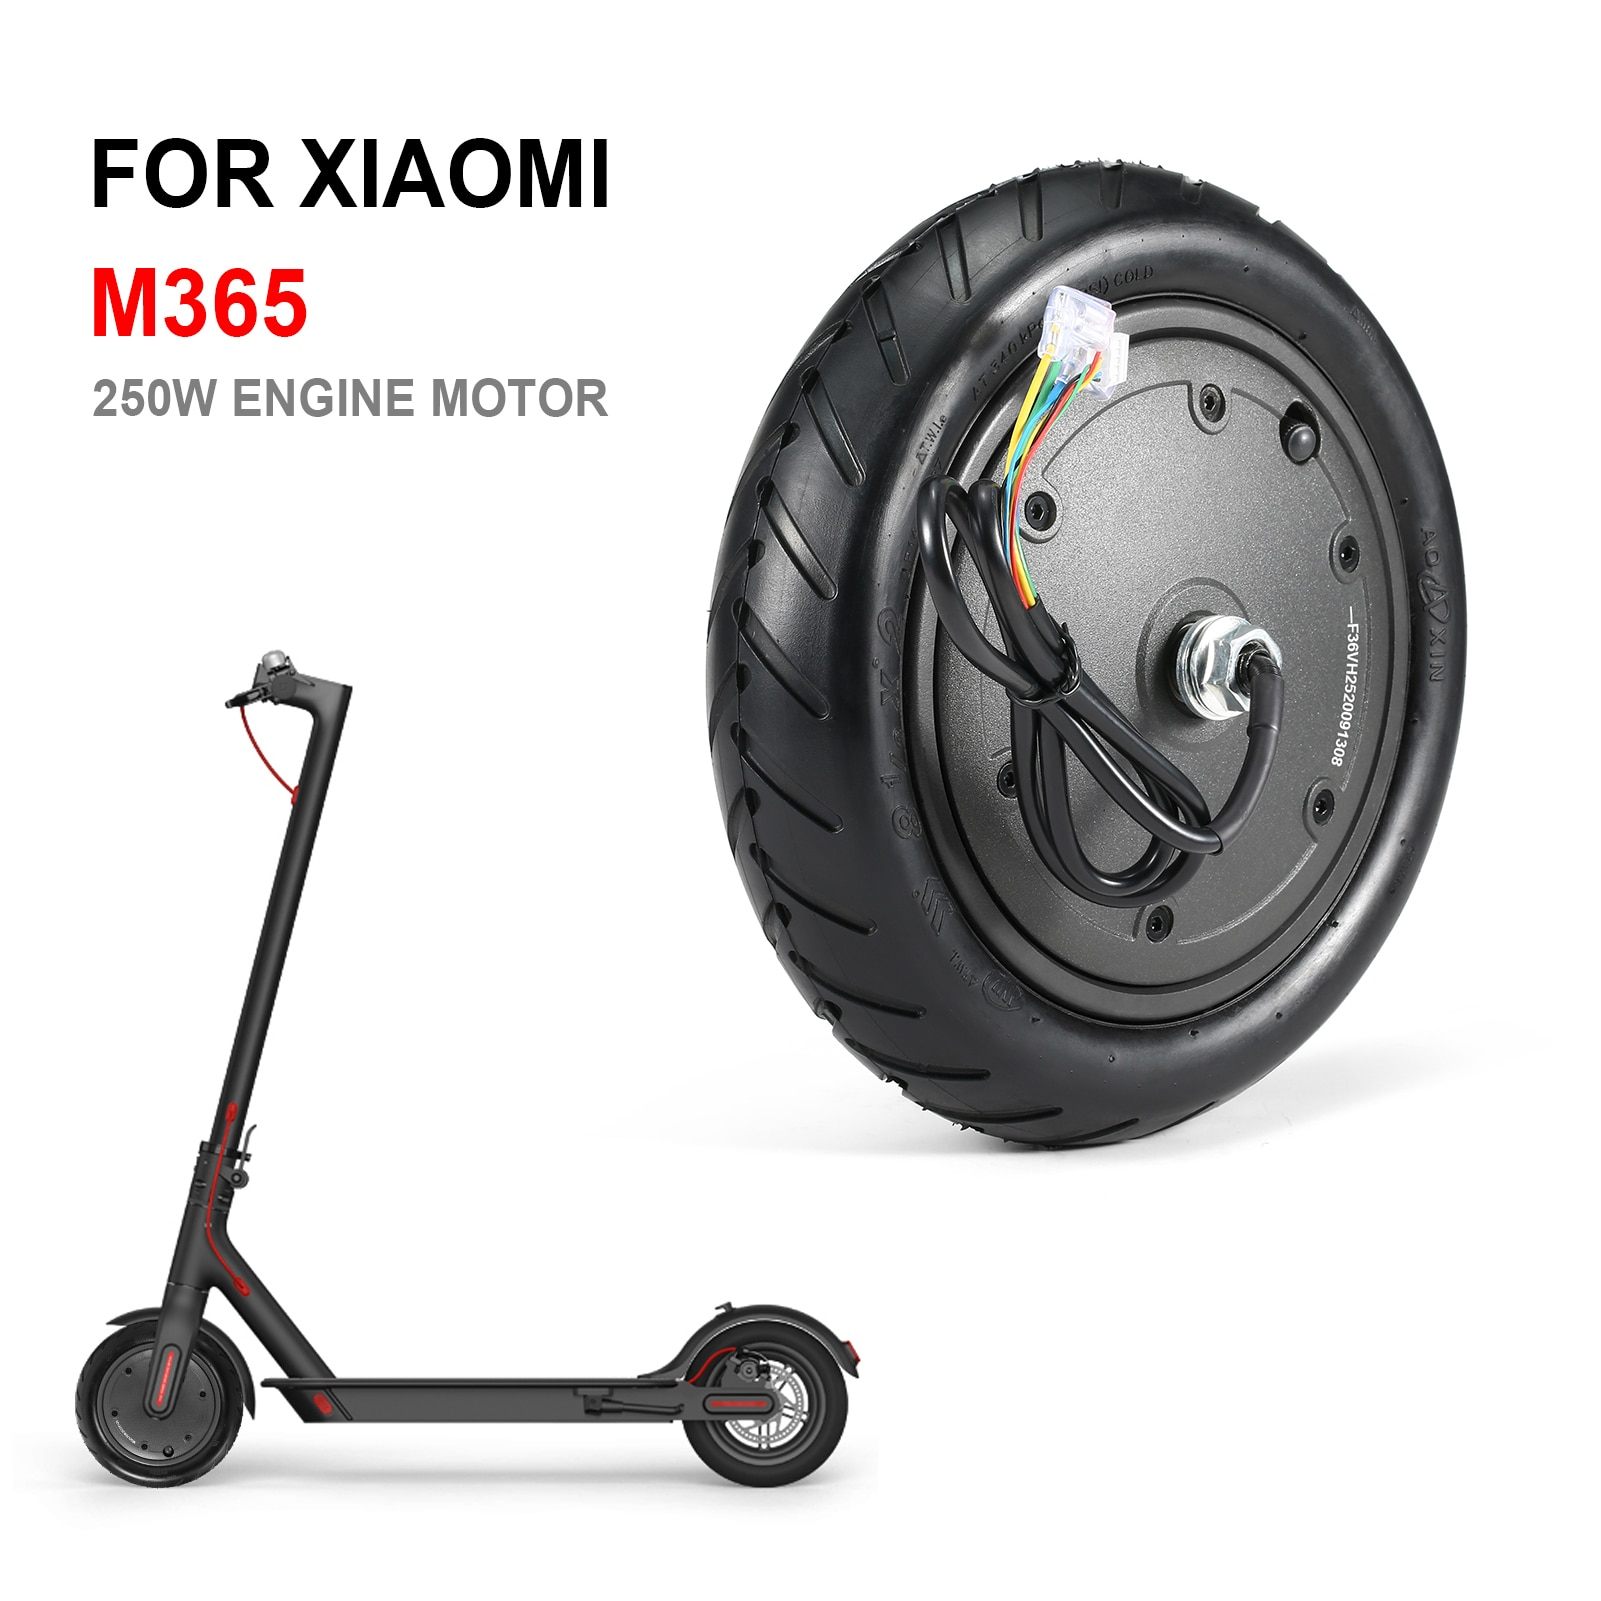 36V 250W محرك موتور ل Xiaomi M365/M365 برو الذكية الكهربائية سكوتر 8.5 بوصة عجلة استبدال أجزاء M365 اكسسوارات